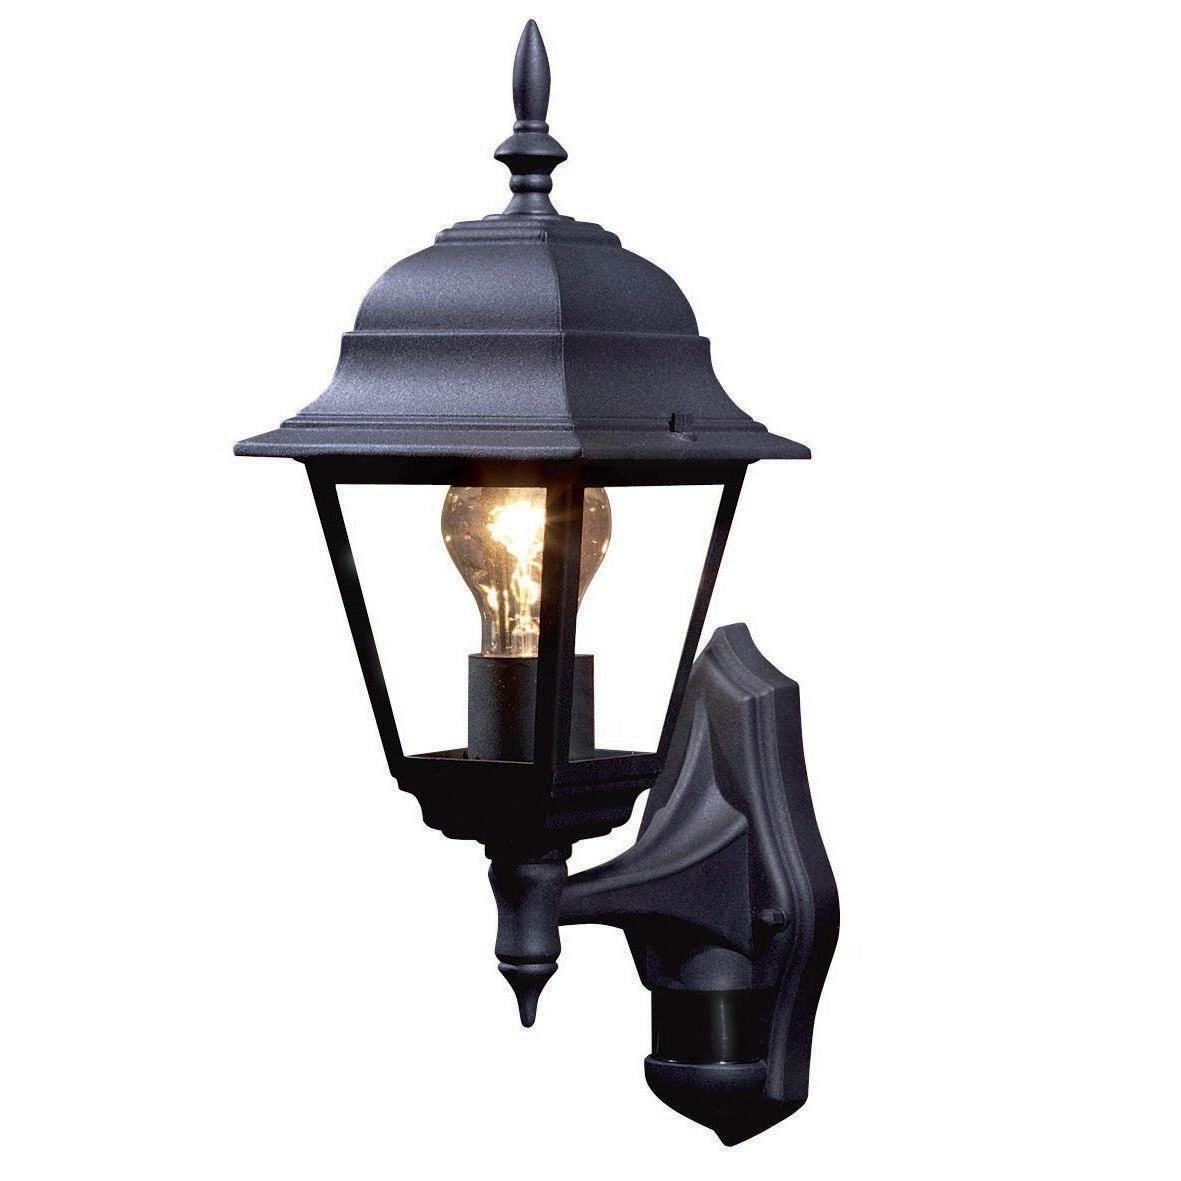 Current Polperro Black 60W Mains Powered External Pir Lantern (View 2 of 20)